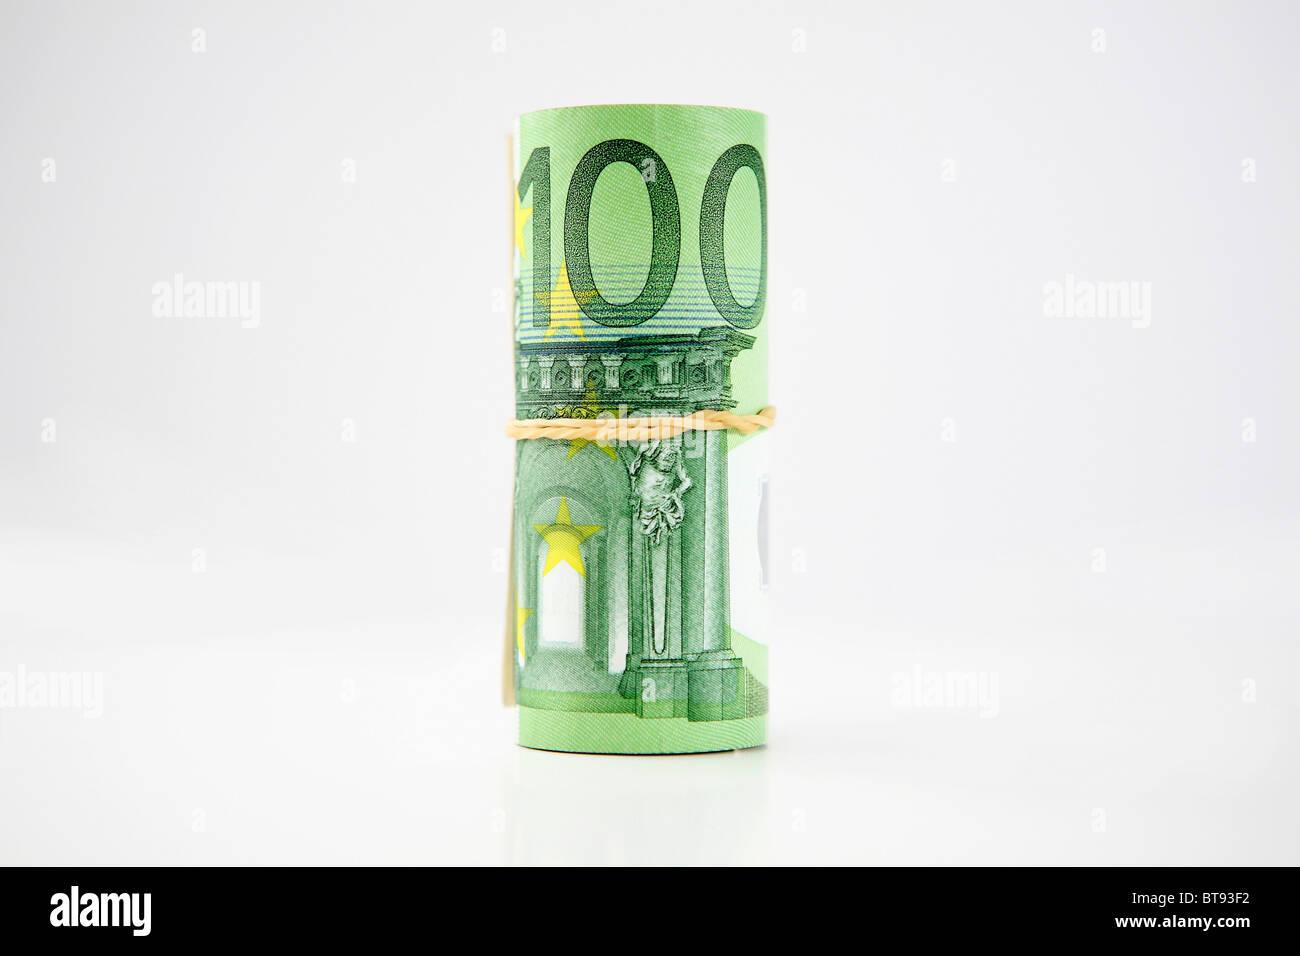 Wad of banknotes, 100 Euros - Stock Image